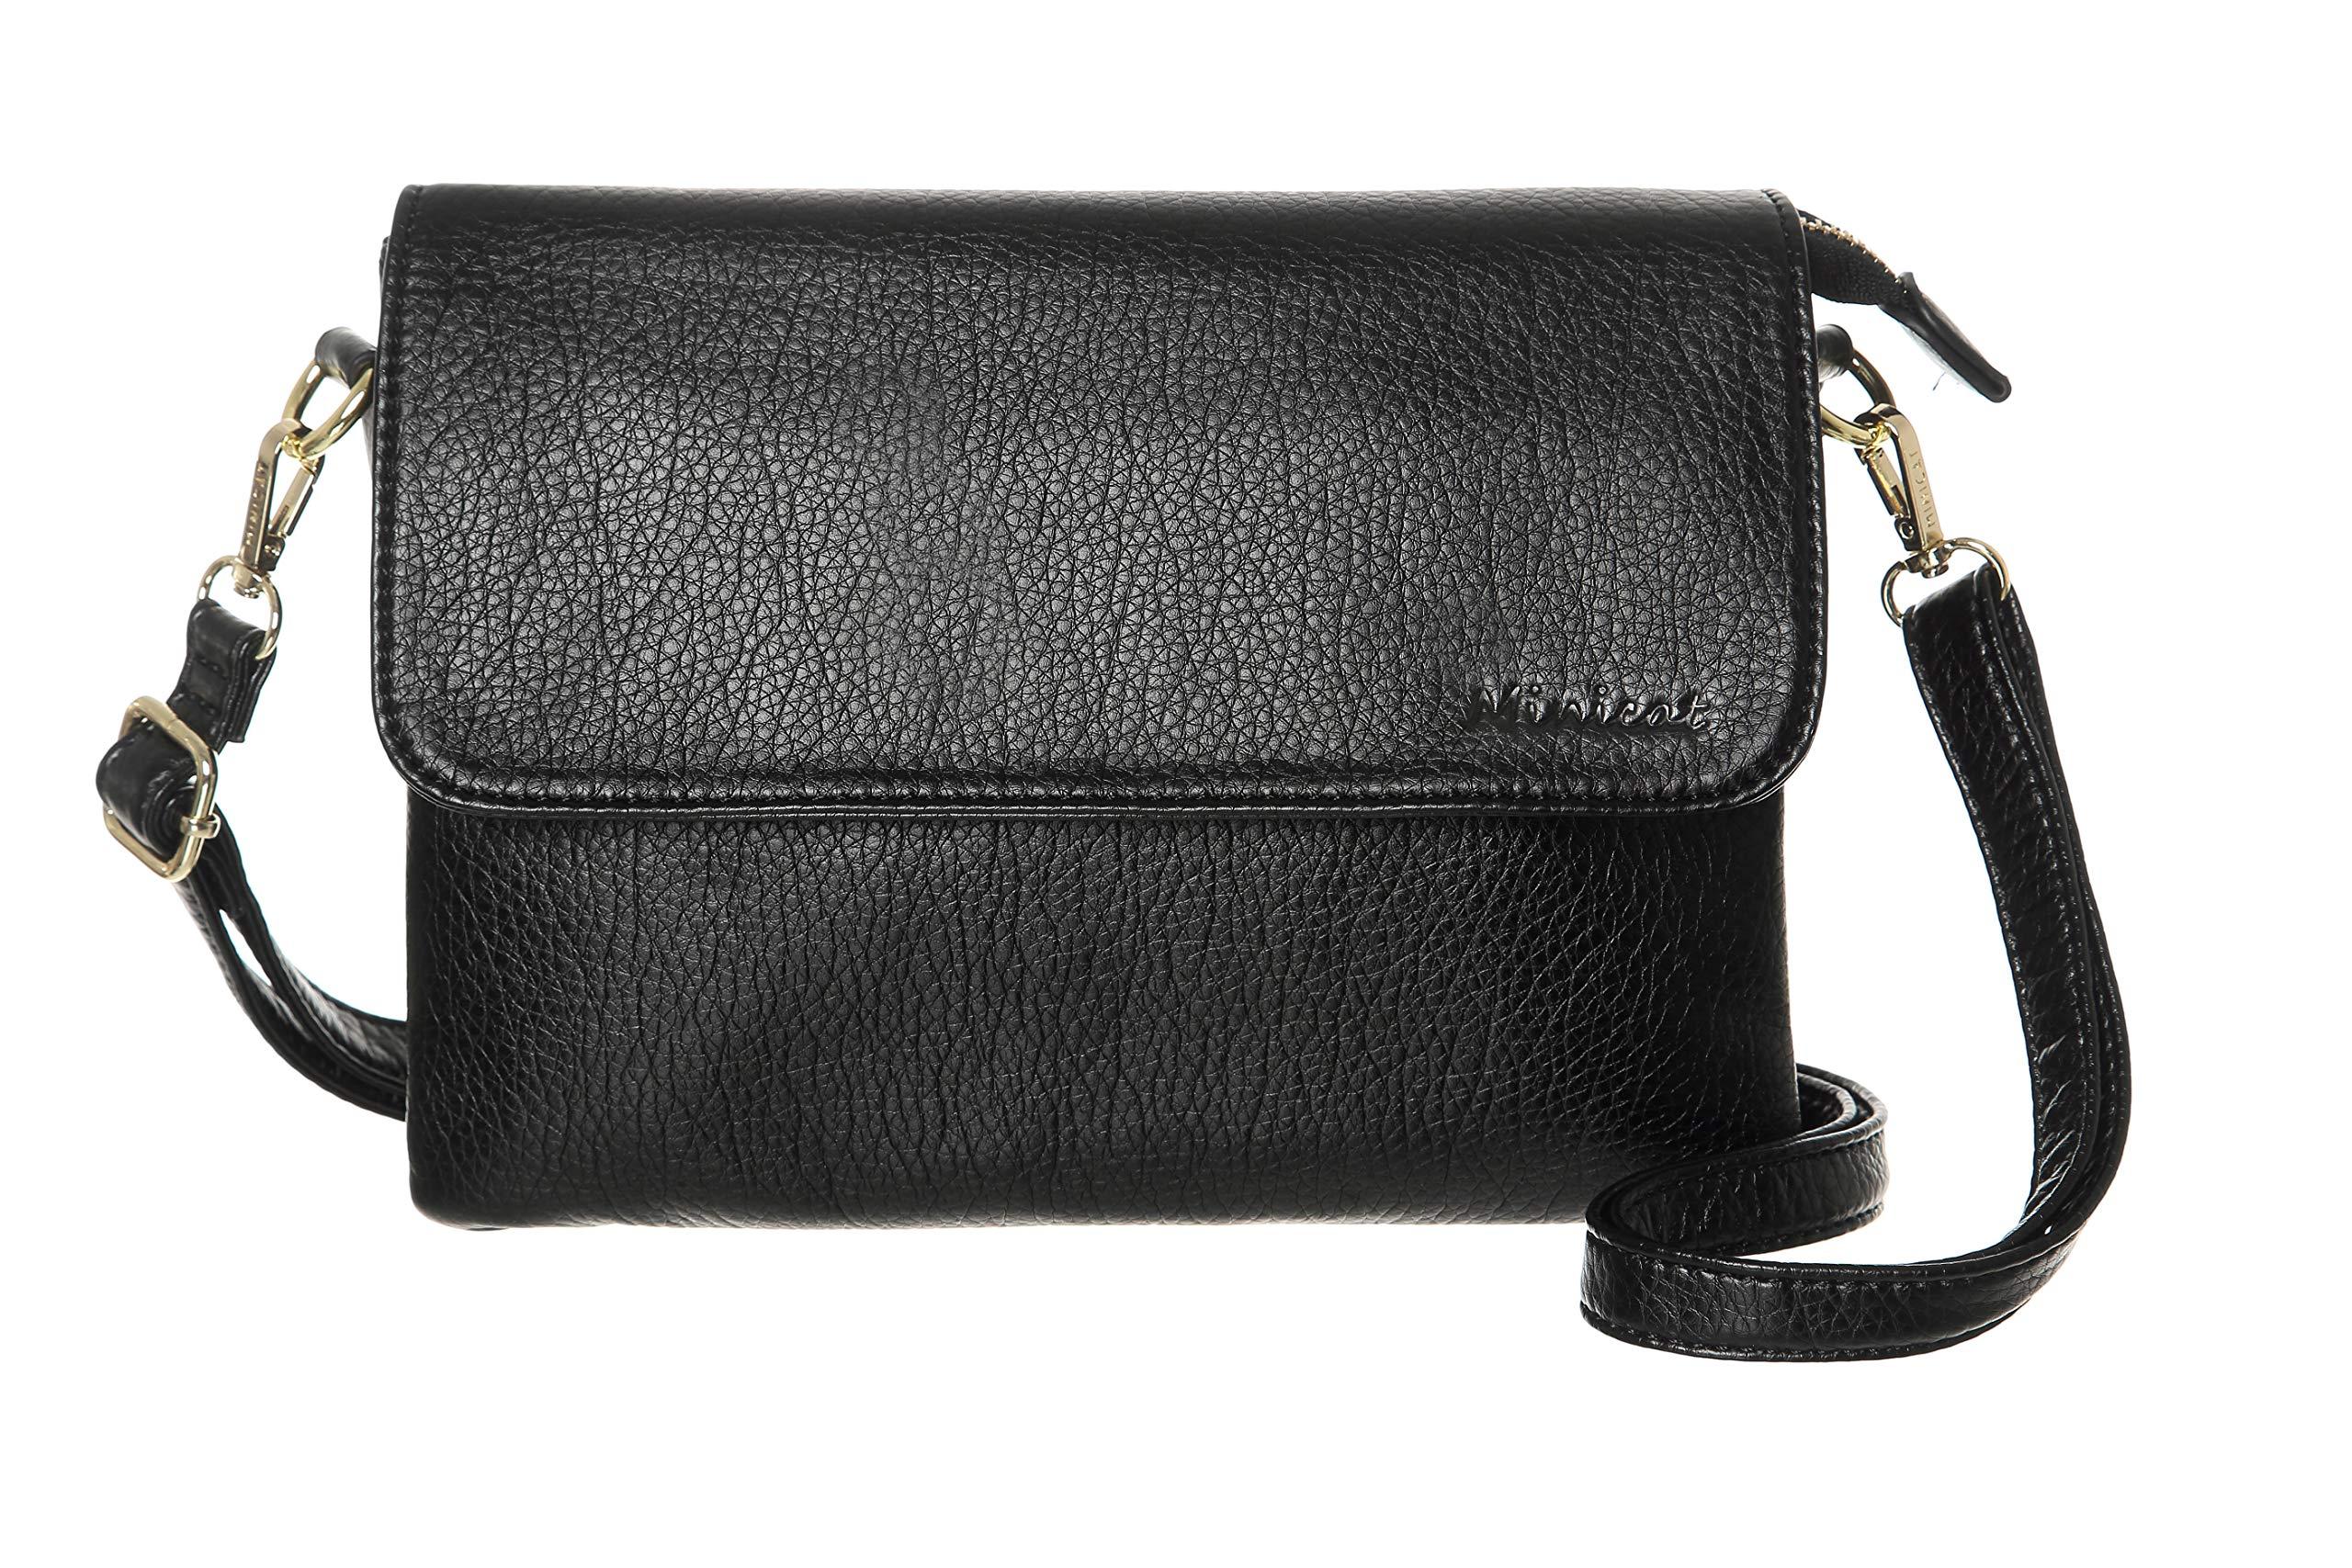 MINICAT Women RFID Blocking Small Crossbody Bags Credit Card Slots Cell Phone Purse Wallet(Black-Large)